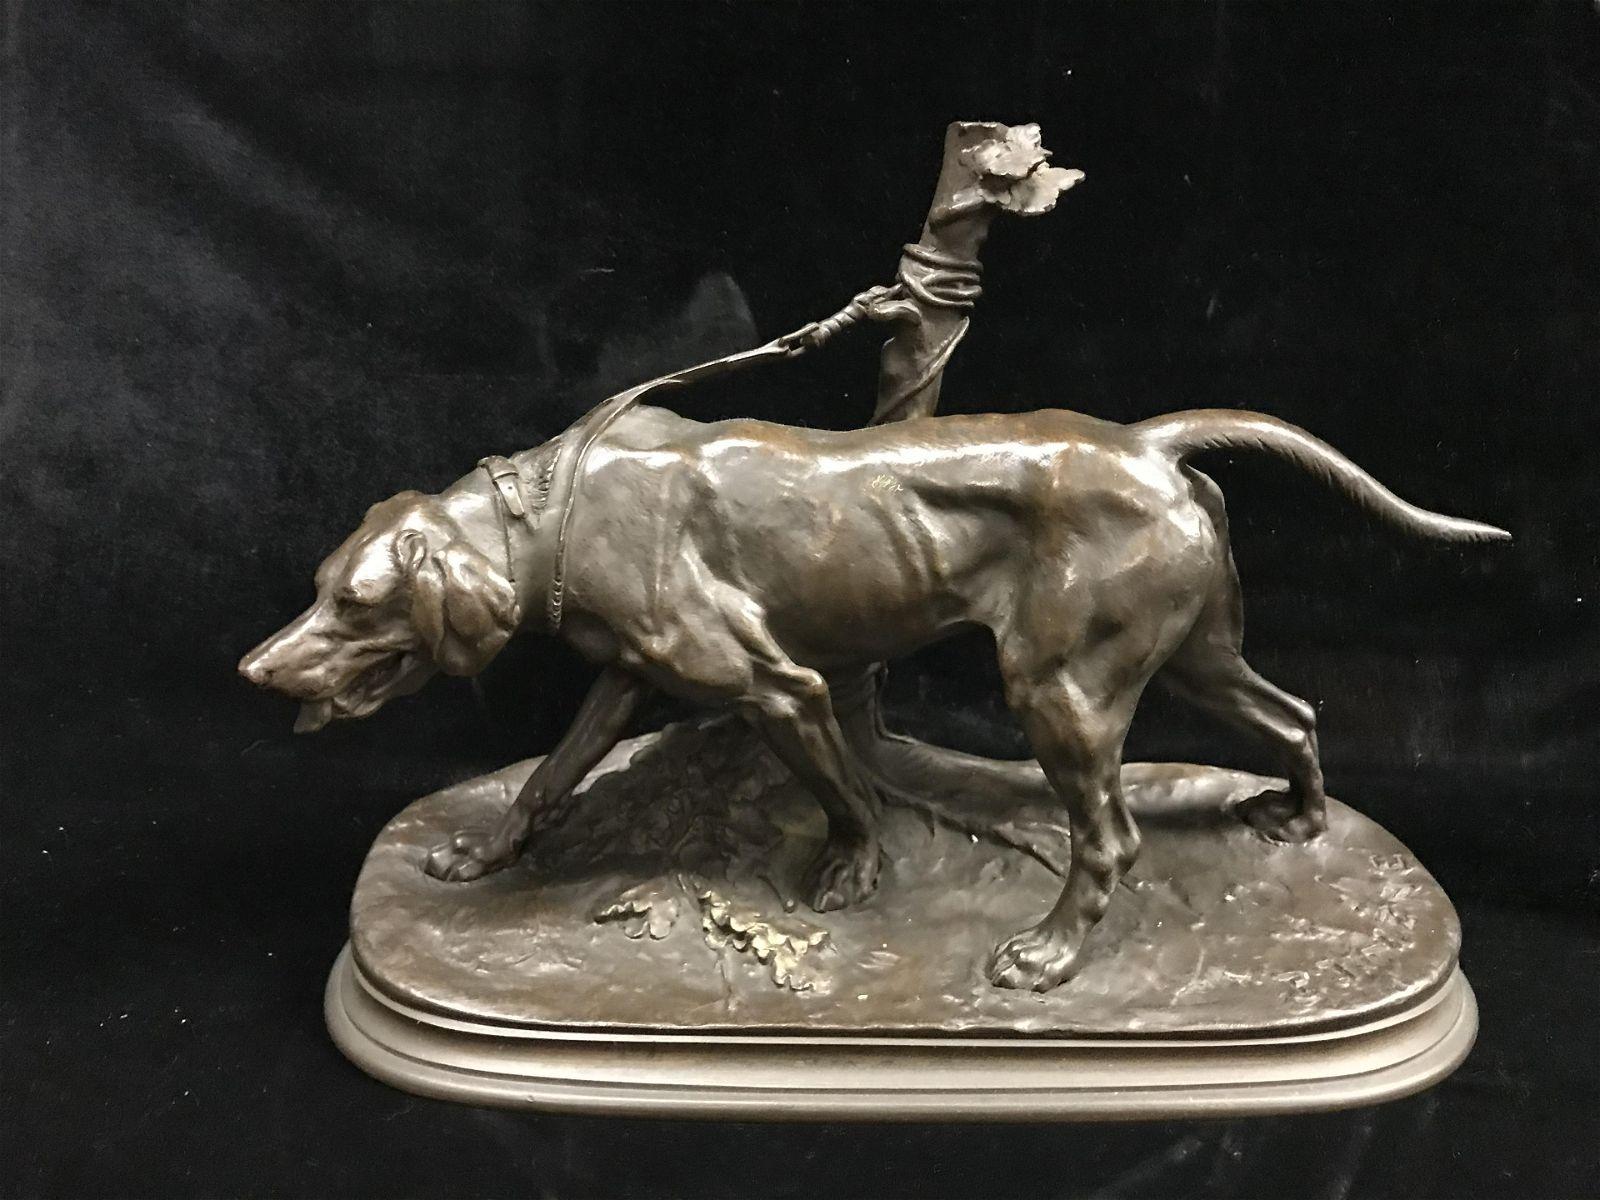 ANTIQUE BRONZE statue of a DOG SIGNED MENNE